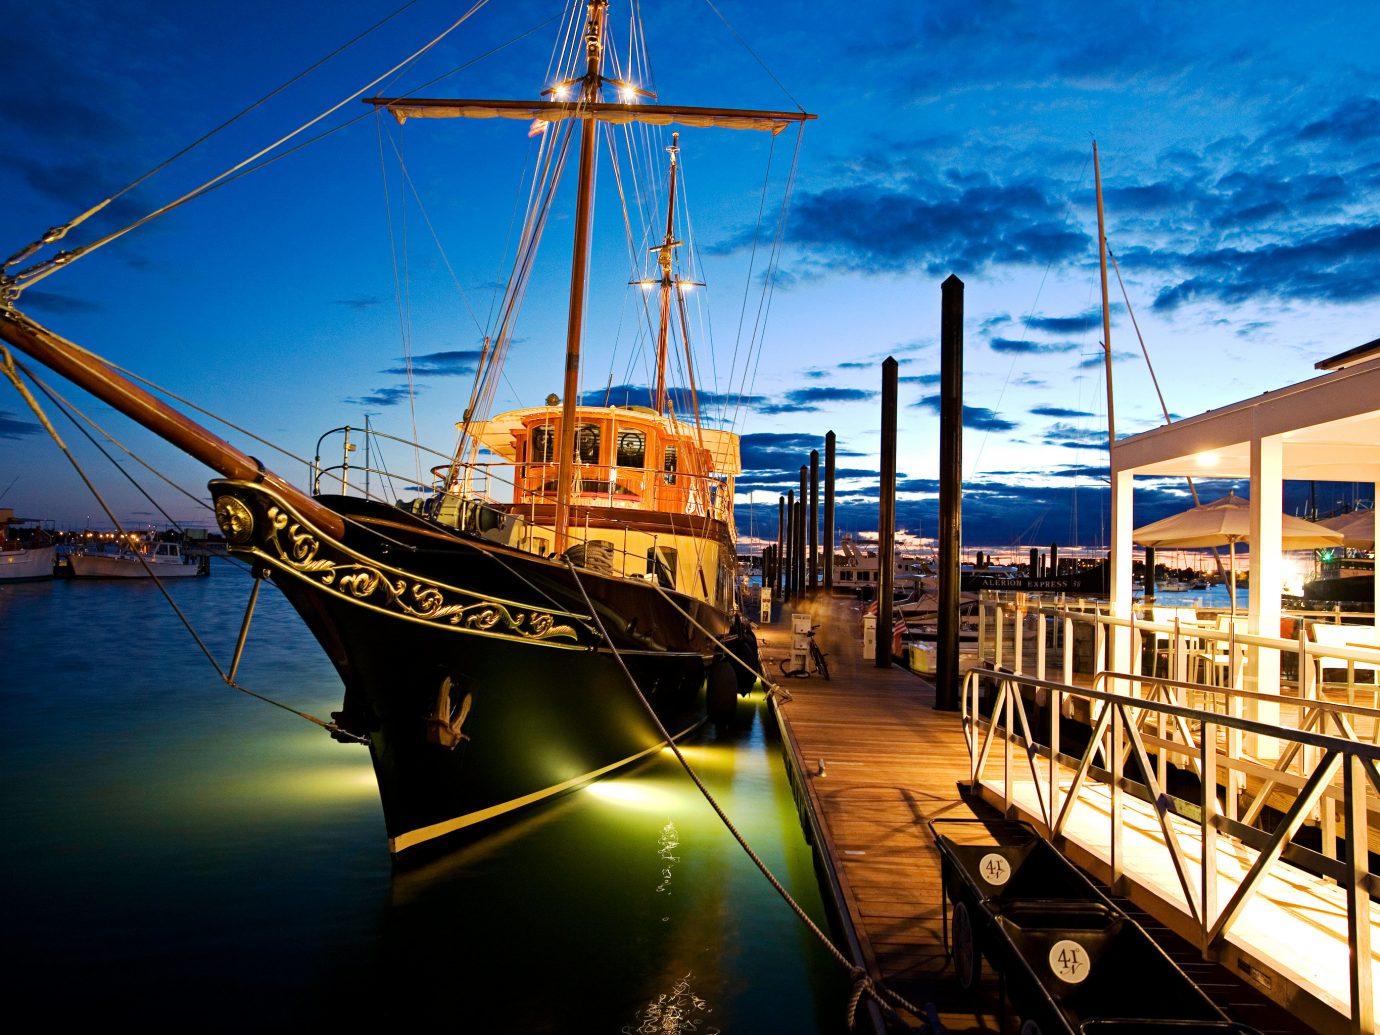 Hotels Boat outdoor sky water vehicle scene reflection night Sea evening Harbor watercraft sailing ship Sunset dock ship tall ship mast dusk cityscape port docked marina